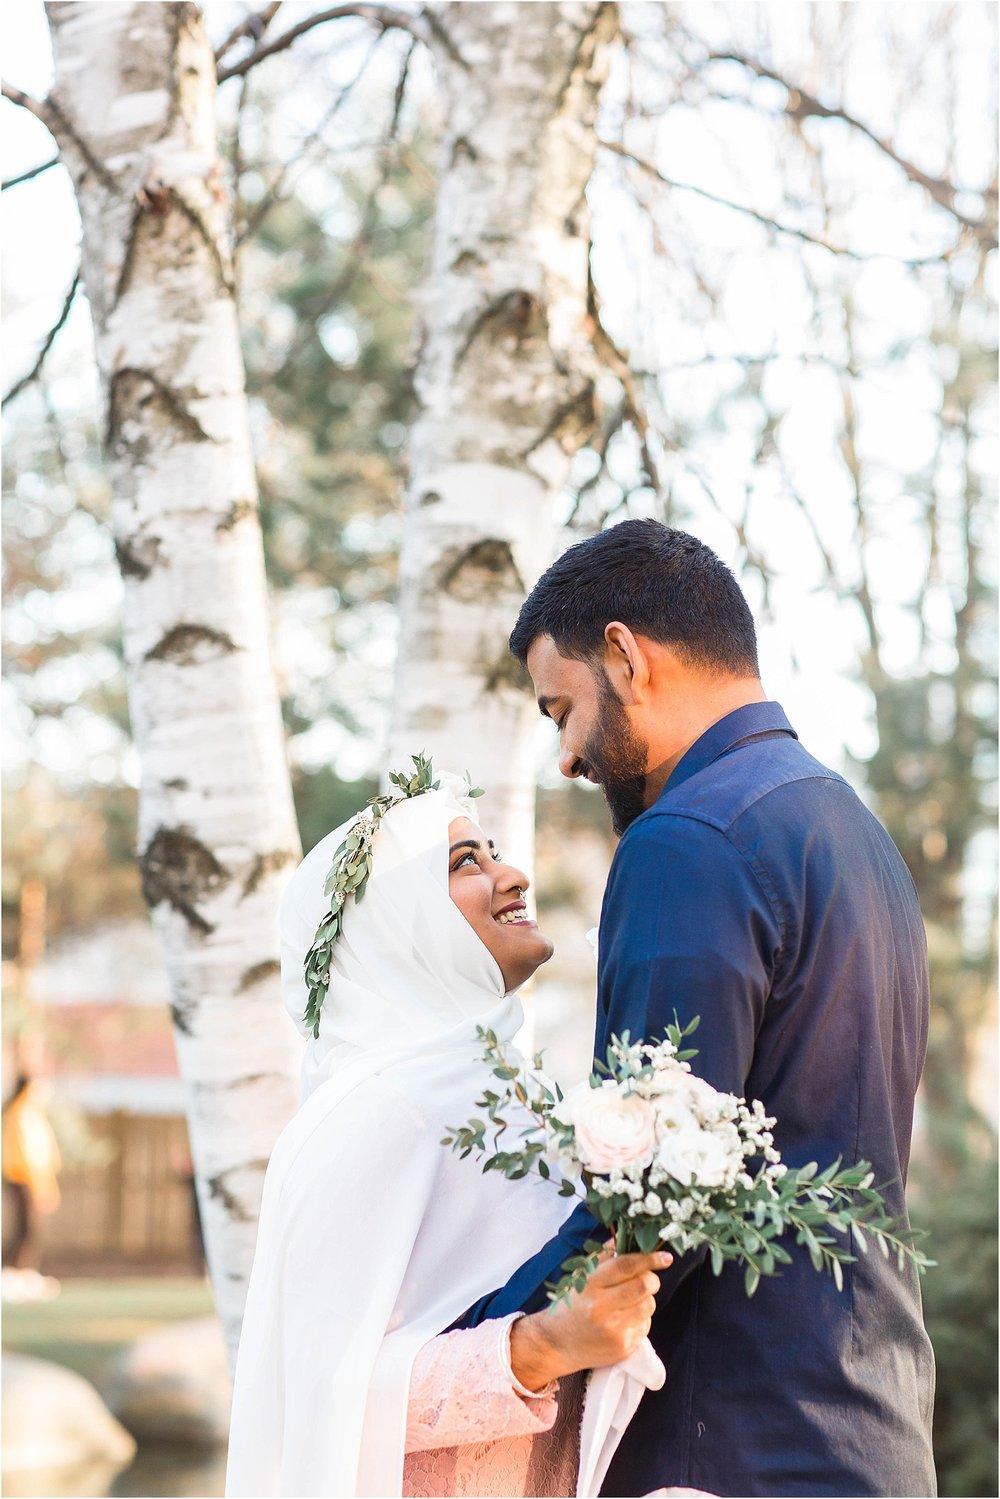 Kariya-Park-Anniversary-Session-Toronto-Mississauga-Brampton-Scarborough-GTA-Pakistani-Indian-Wedding-Engagement-Photographer-Photography_0007.jpg